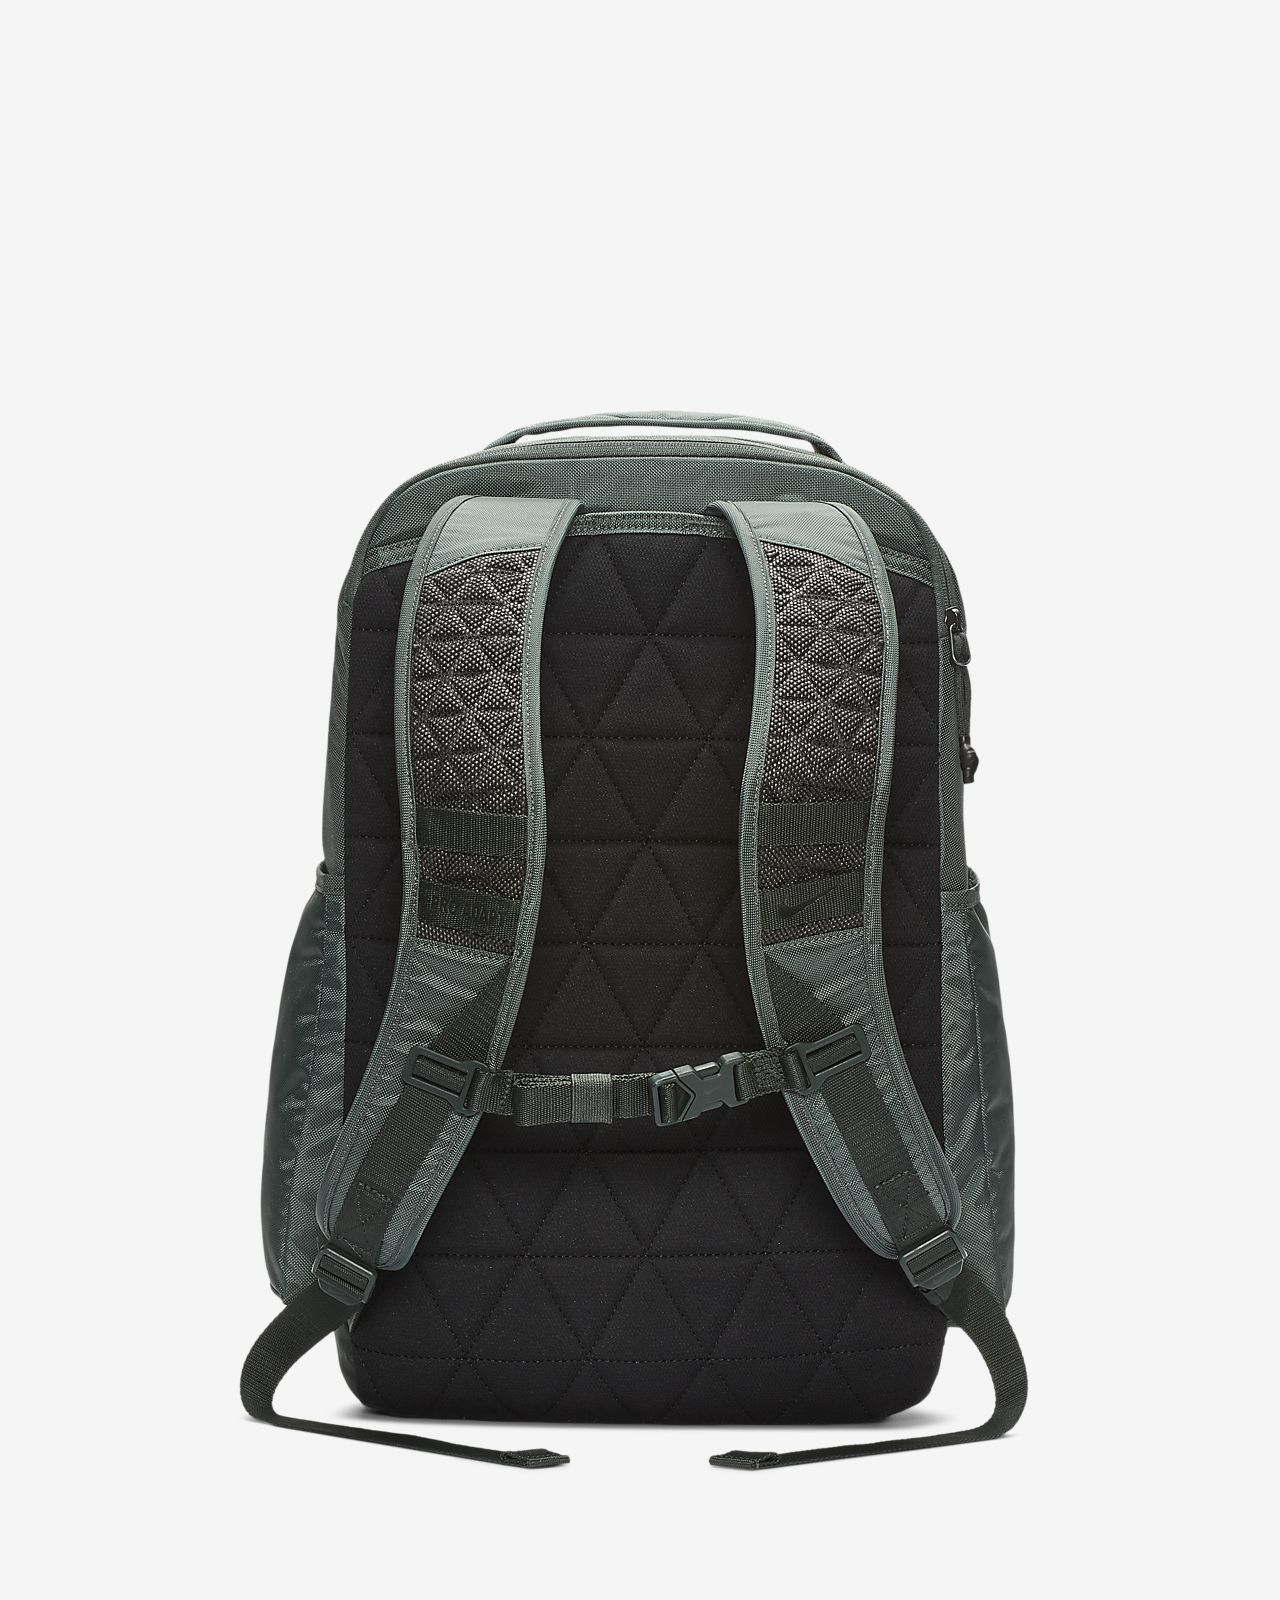 67f865ee87ab Nike Vapor Power 2.0 Training Backpack. Nike.com